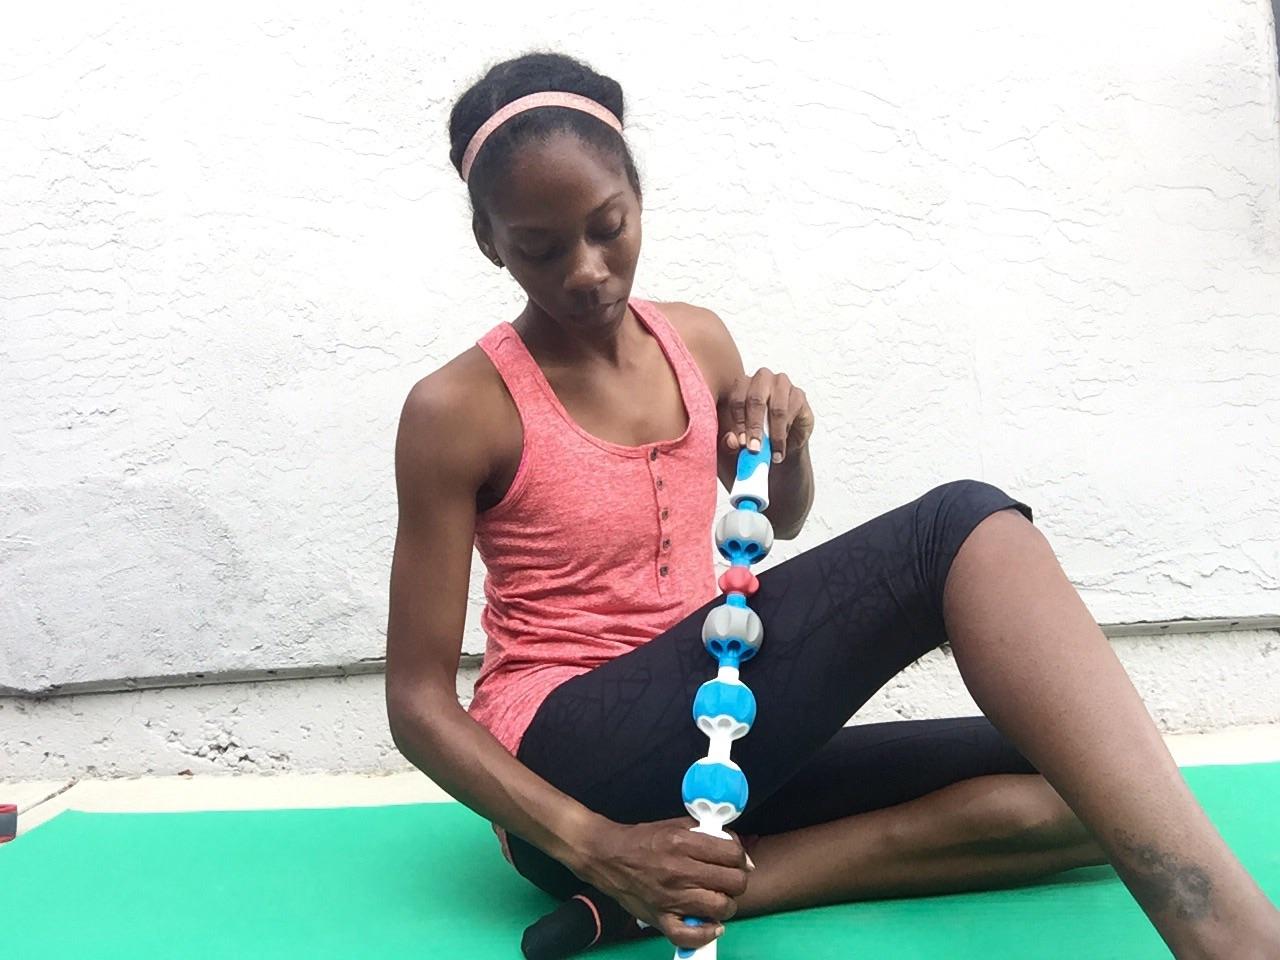 Addaday Pro Massage Roller